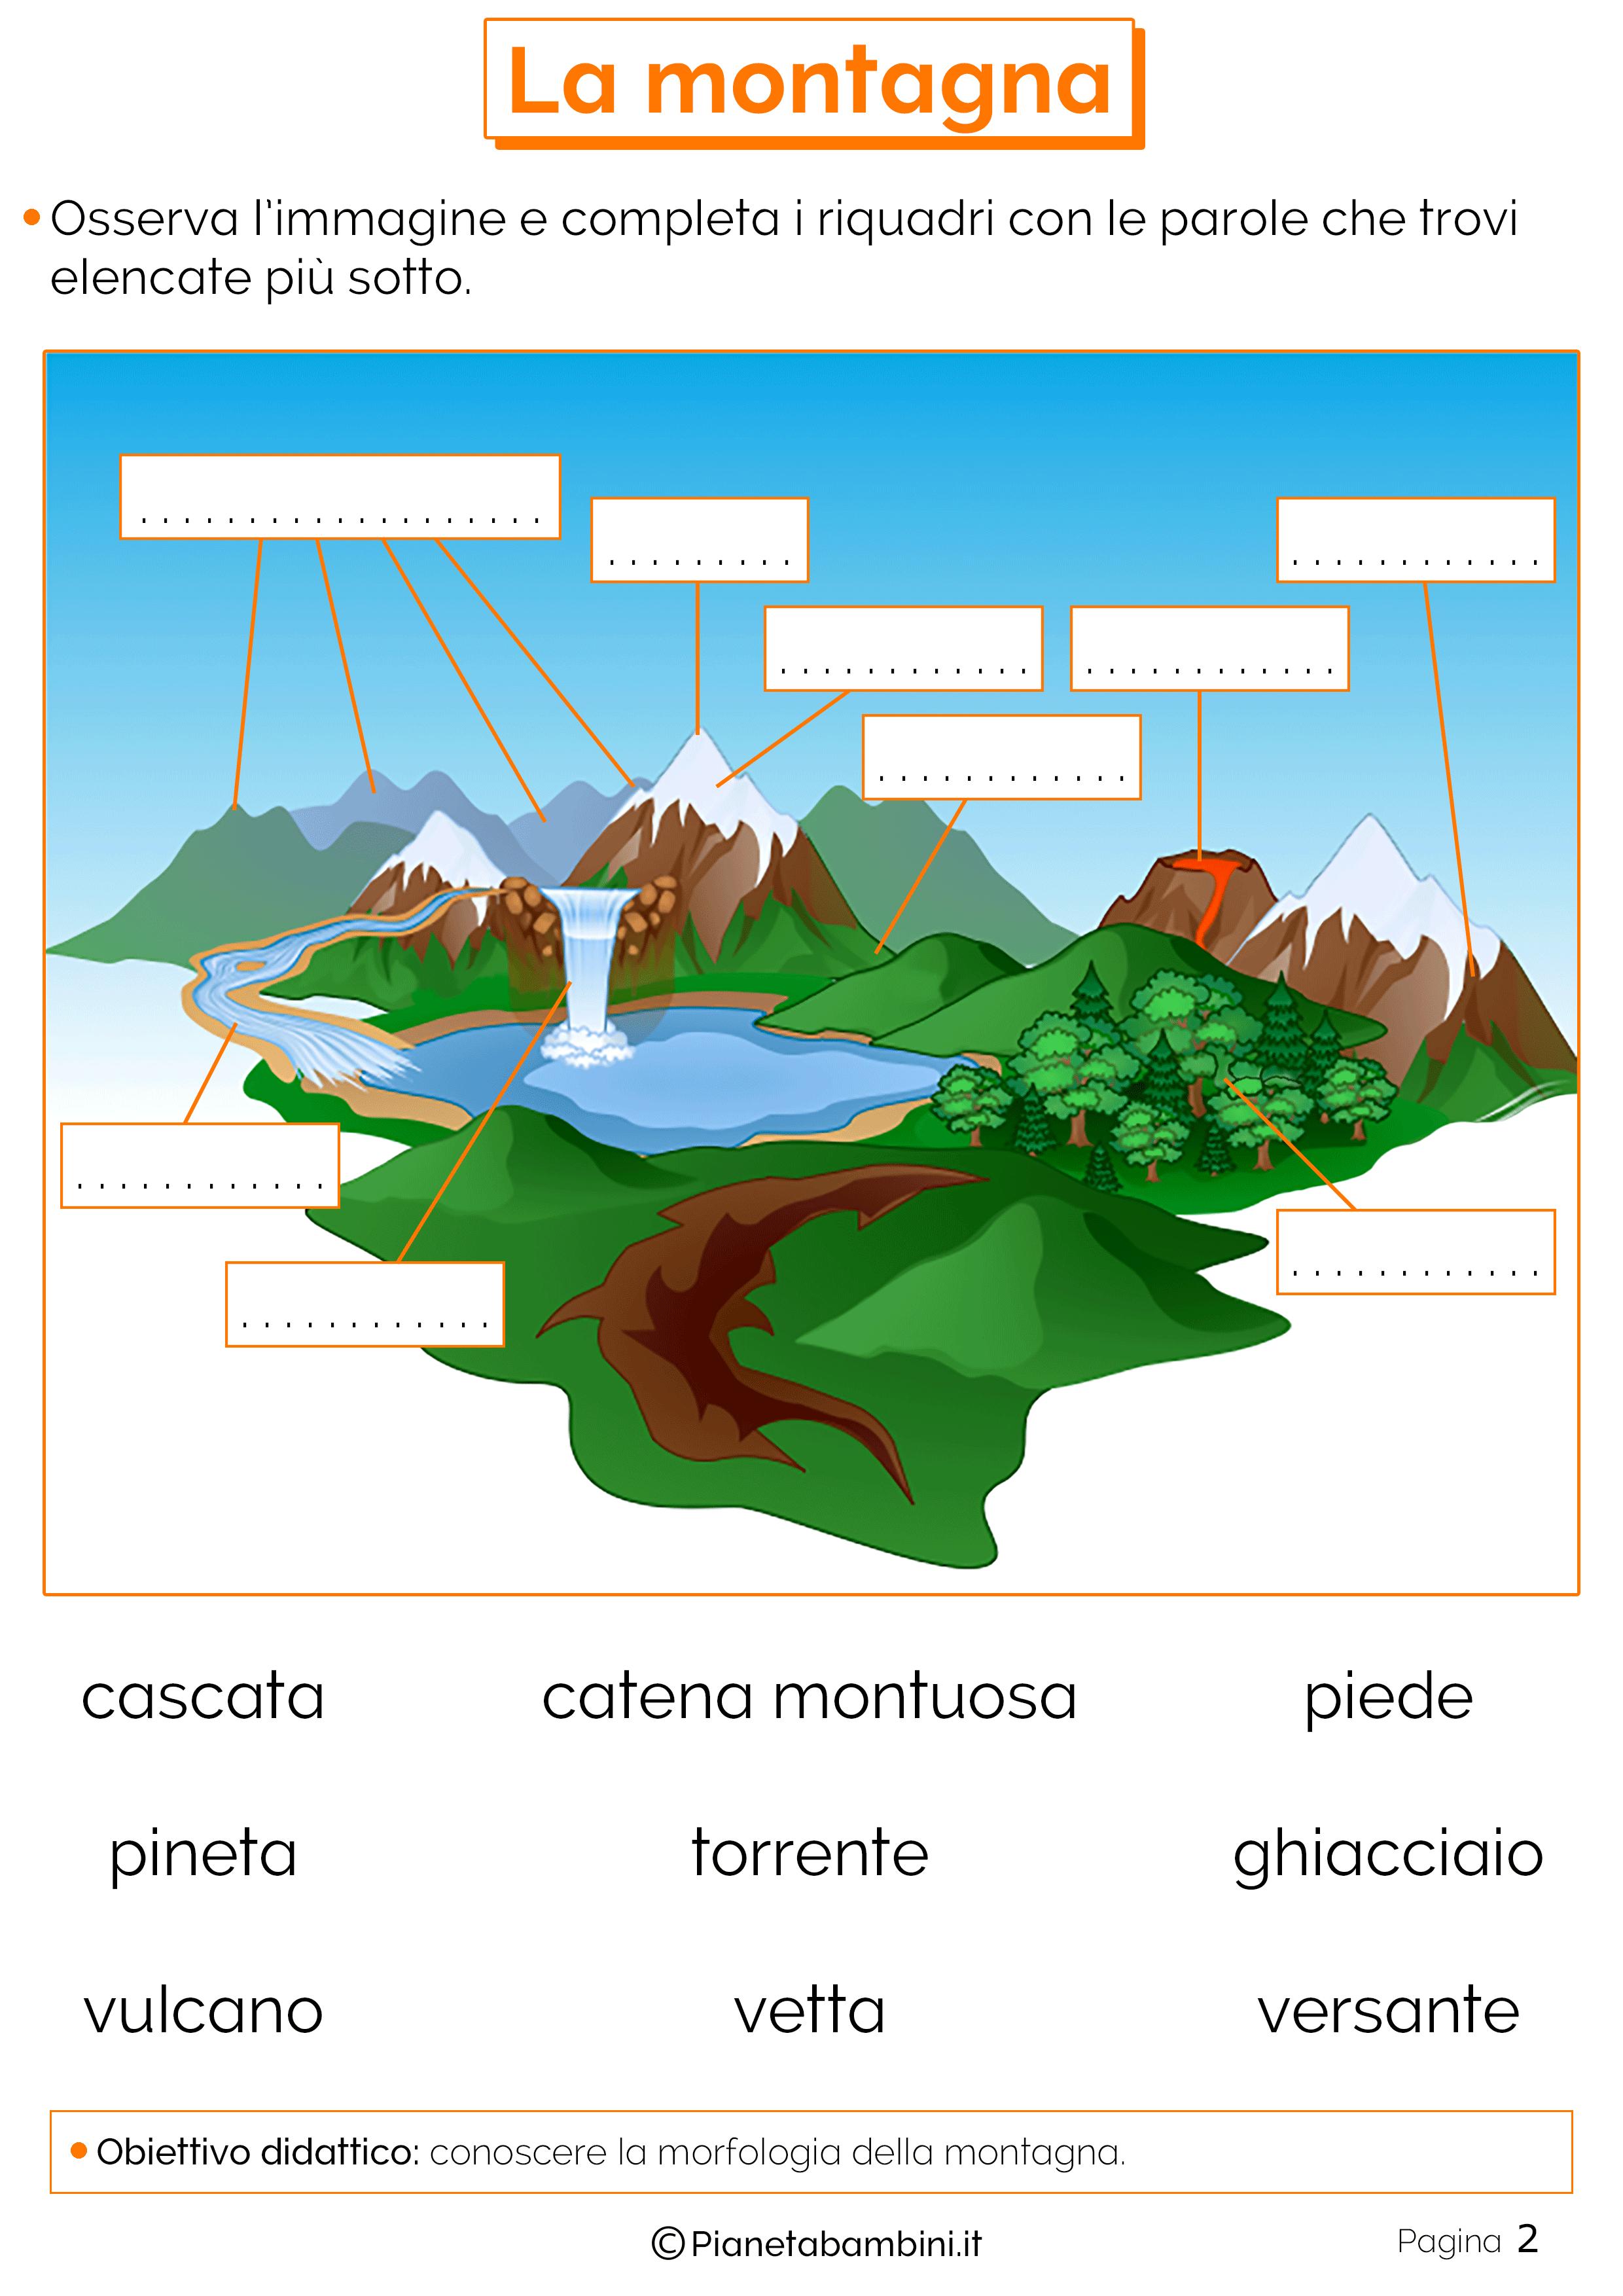 La morfologia della montagna